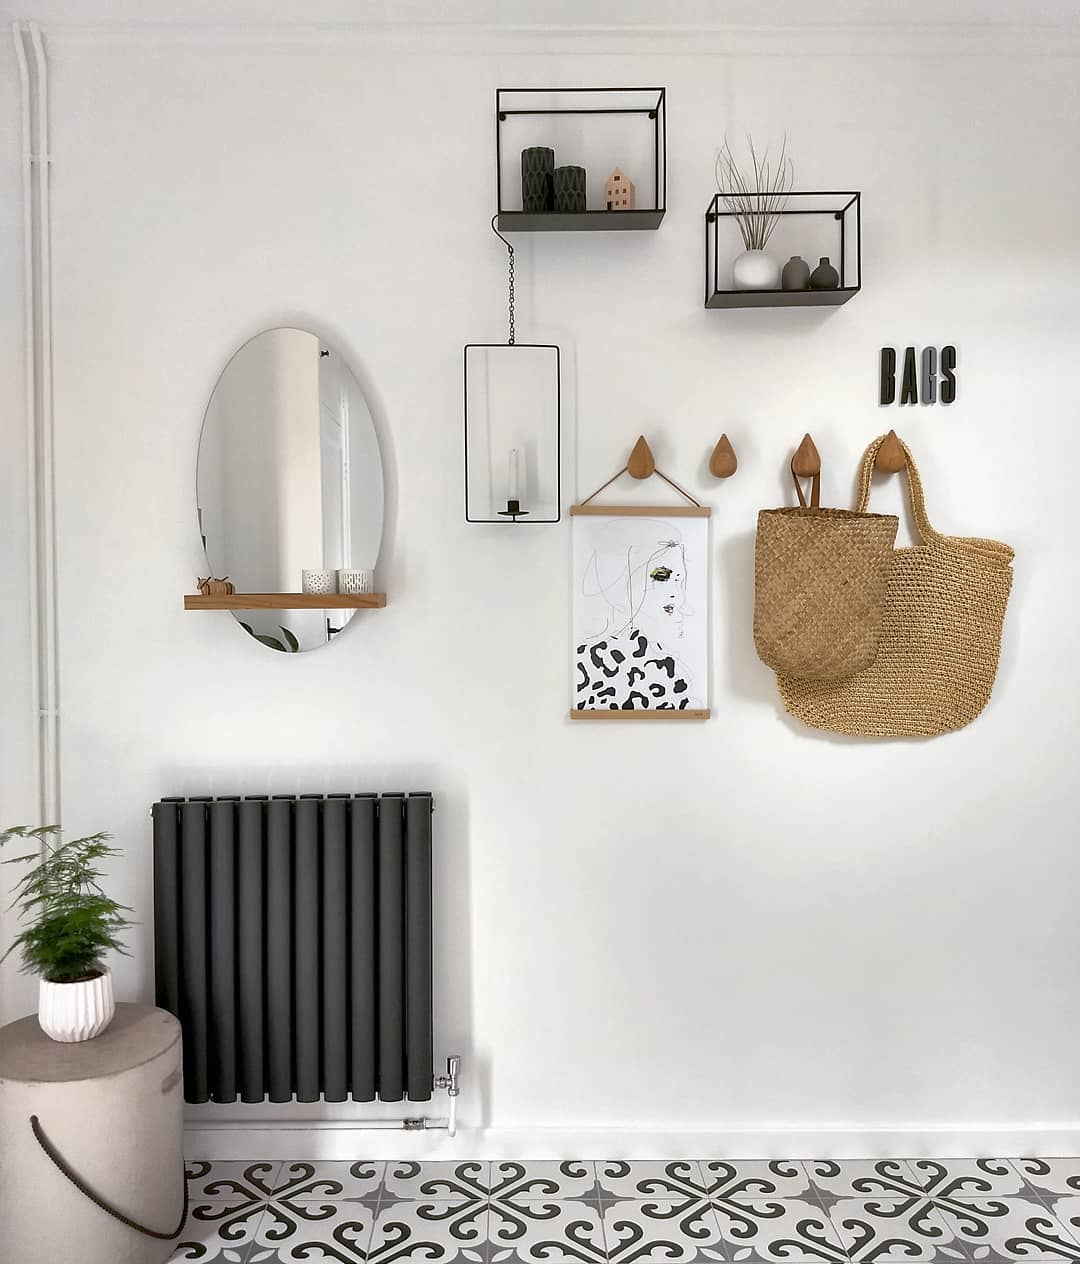 Milano Aruba designer radiator on a white wall.